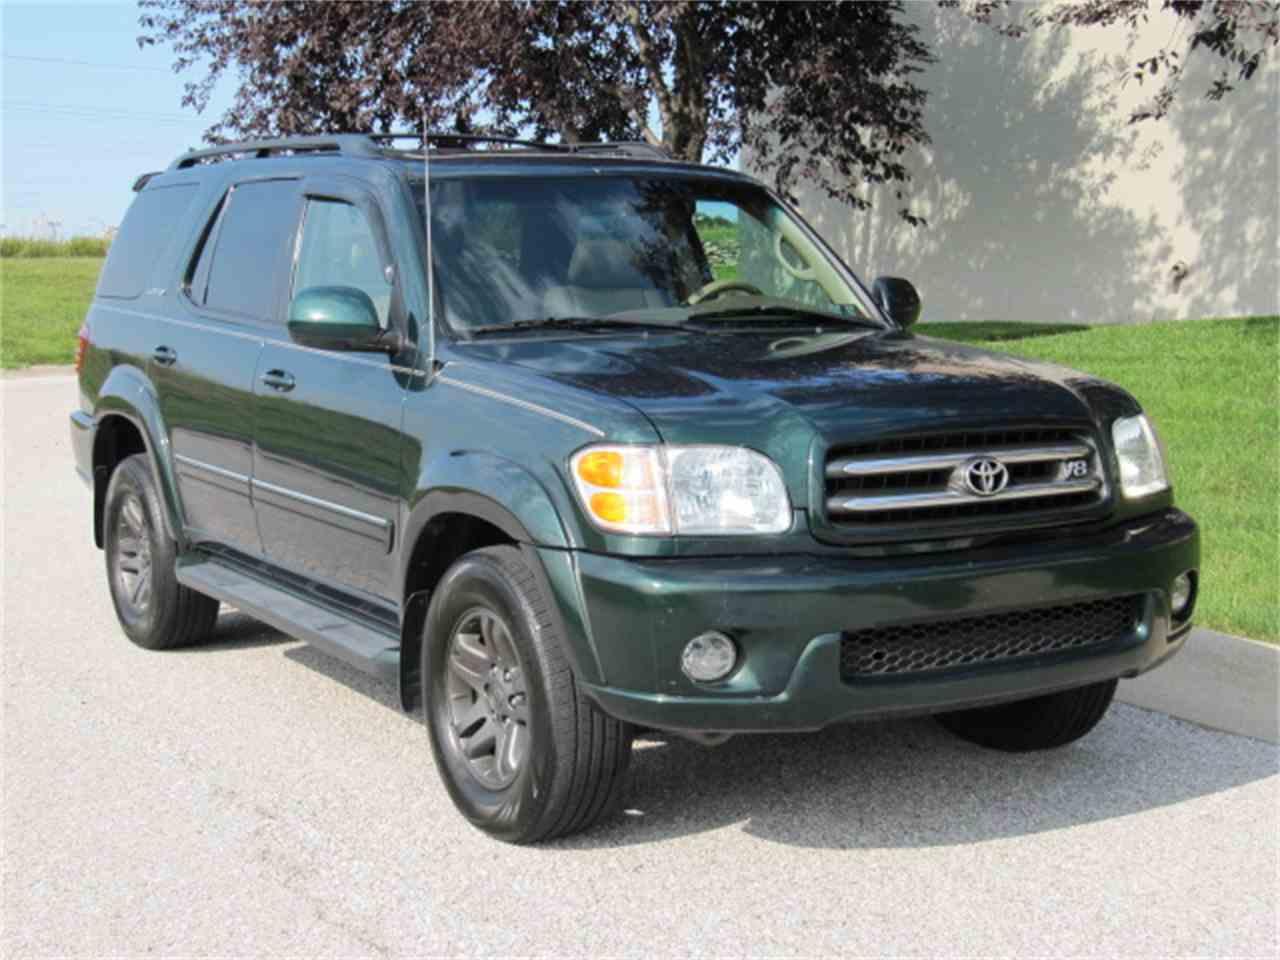 2003 Toyota Sequoia for Sale - CC-878209